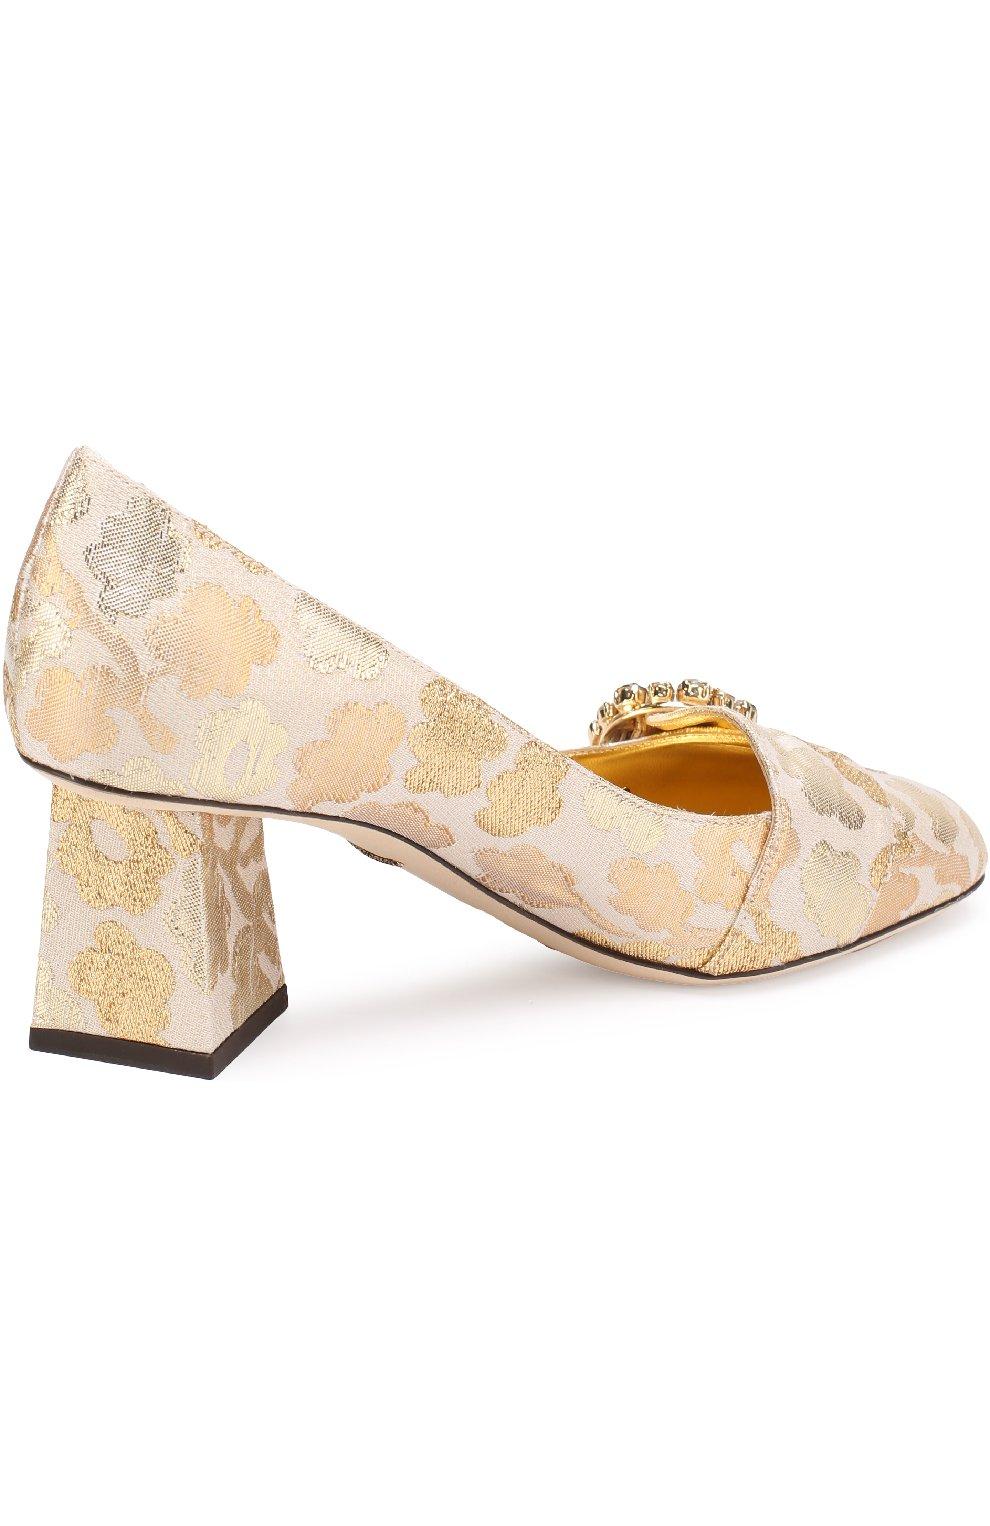 Парчовые туфли Jackie на фигурном каблуке | Фото №3